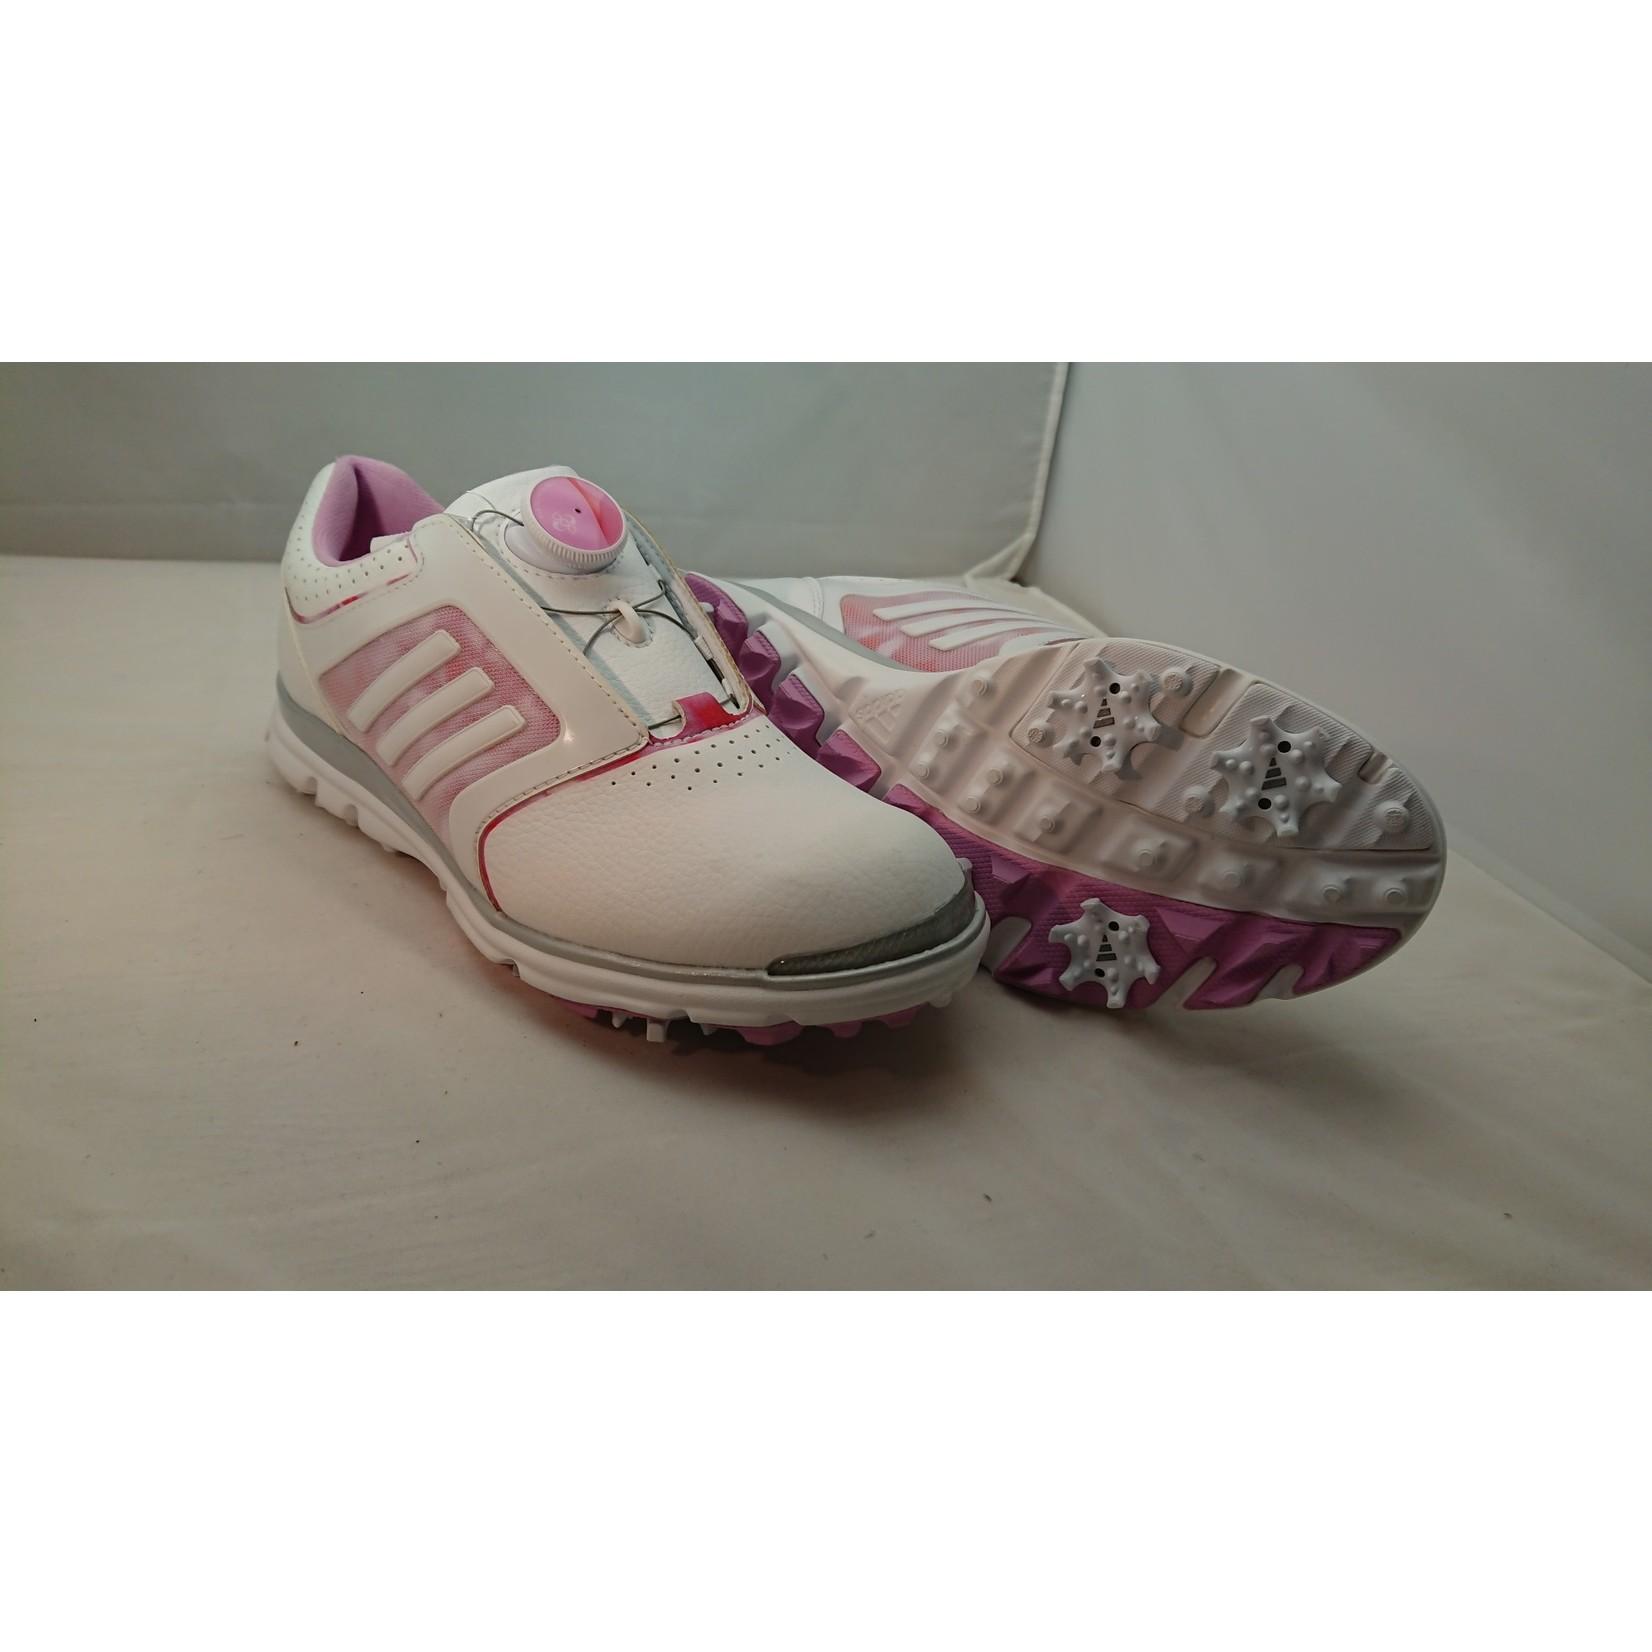 Adidas Adidas W Adistar Tour Boa Wit/Rose 37 1/3